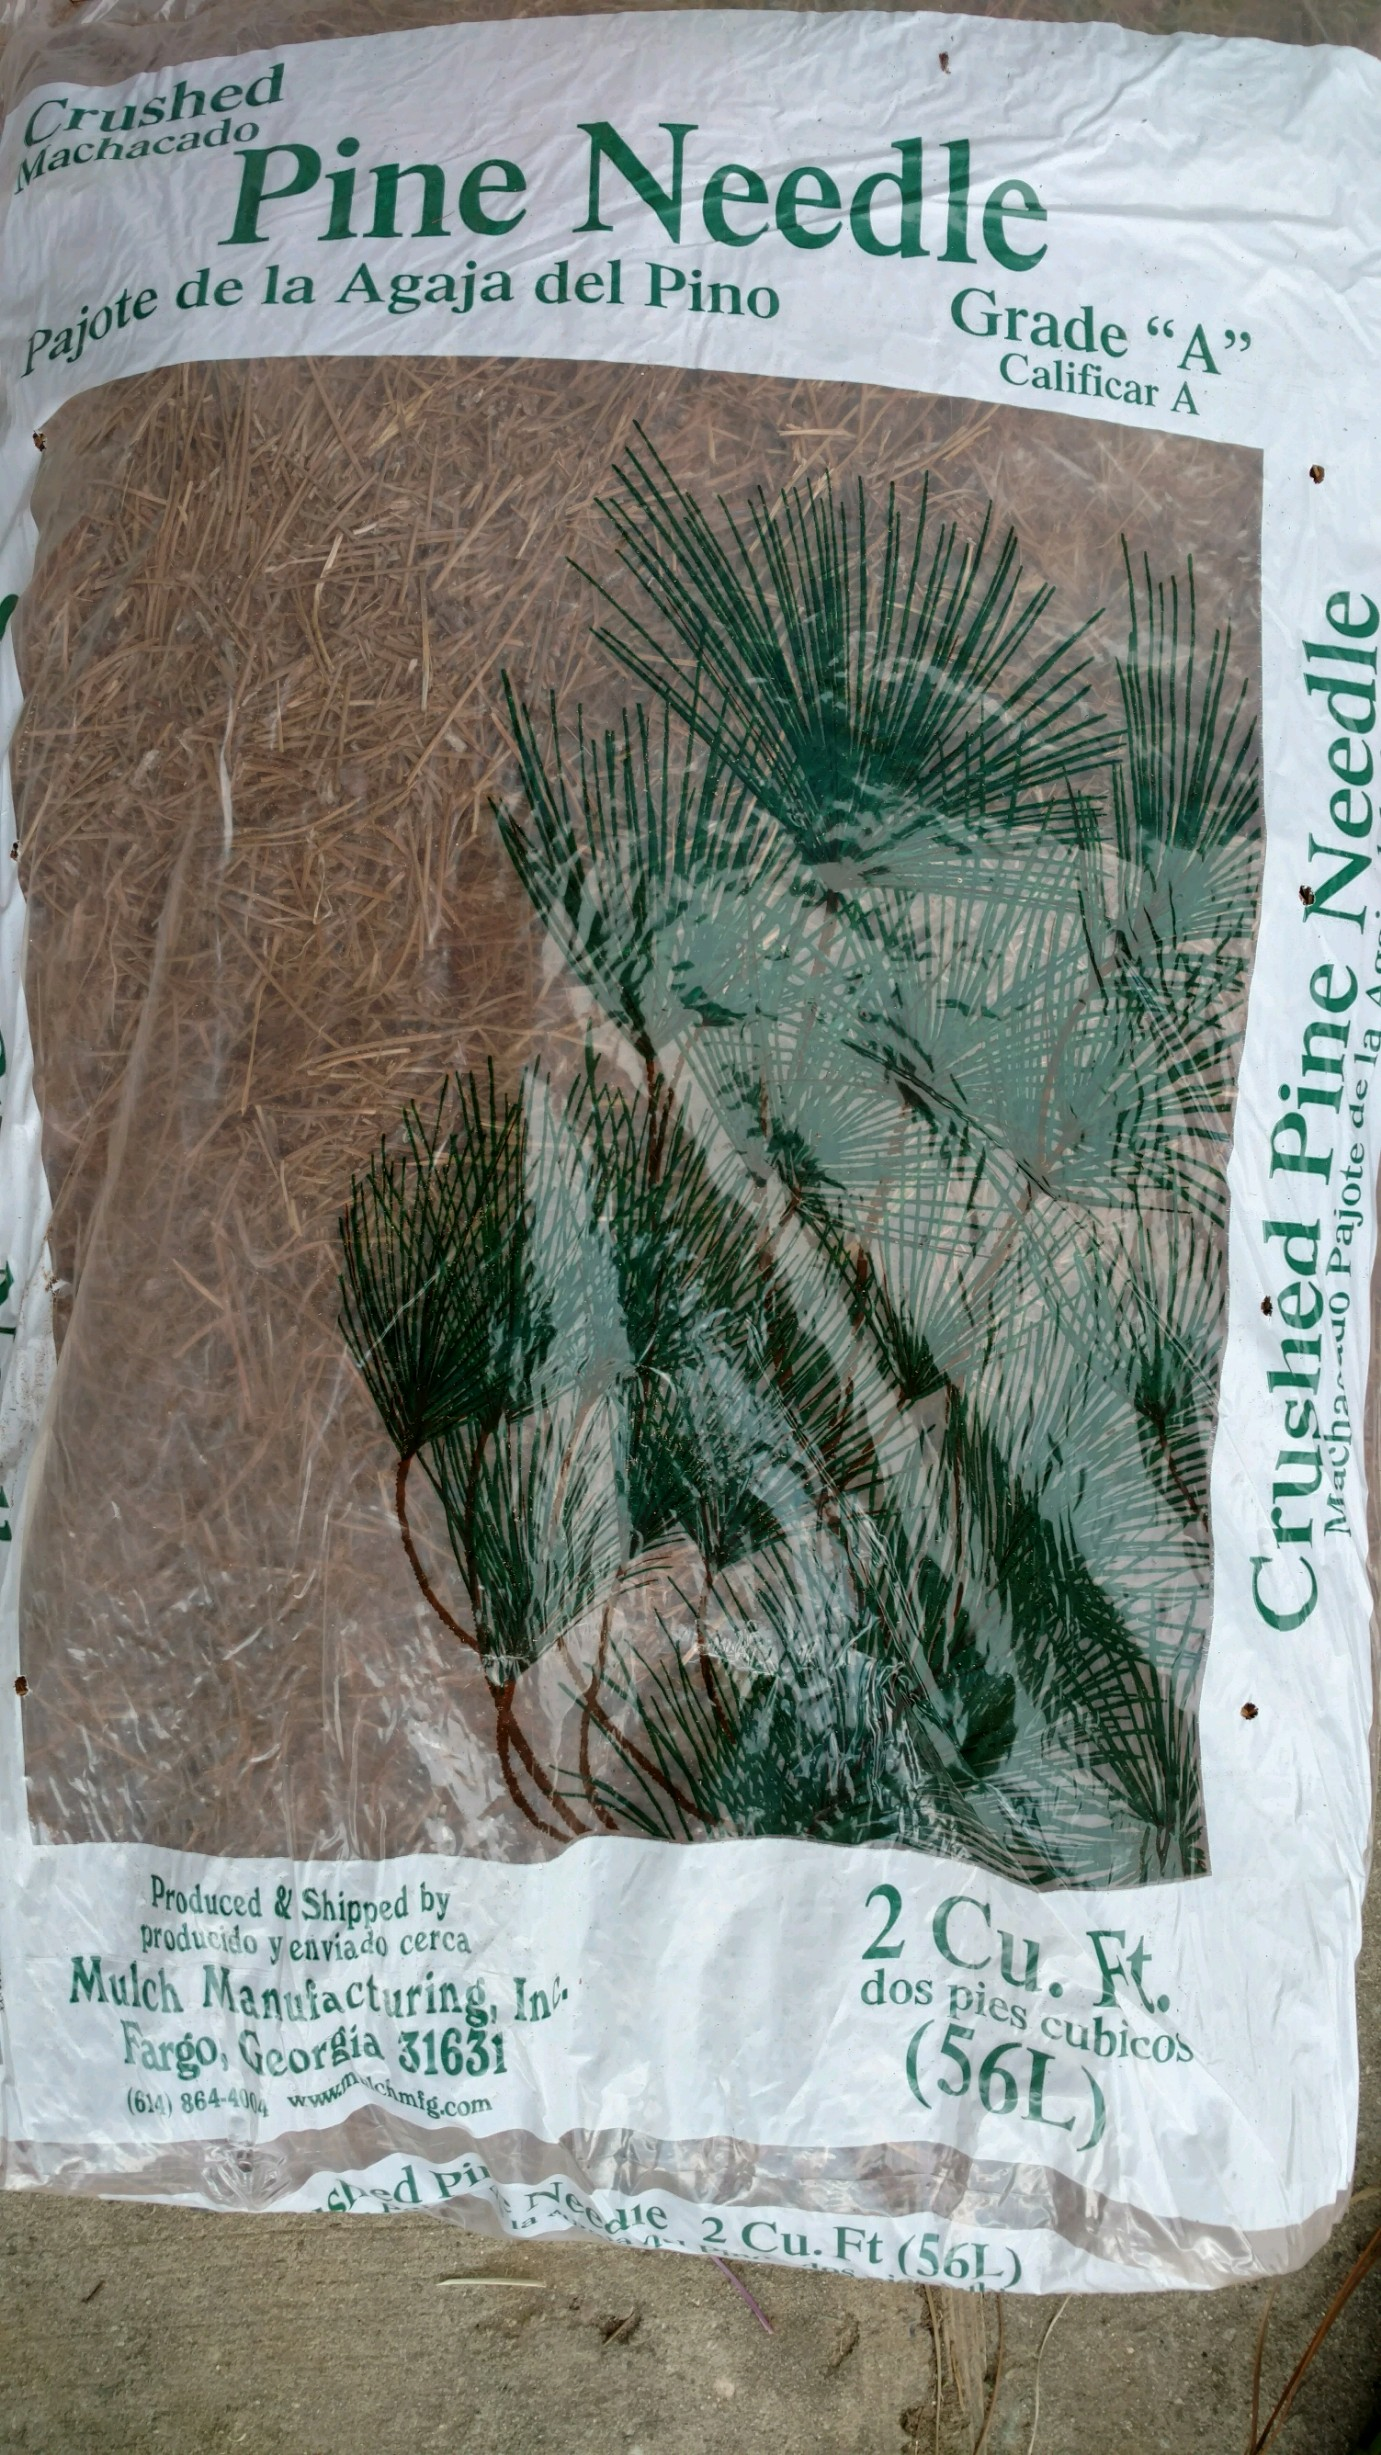 Pine Needle Mulch.jpg